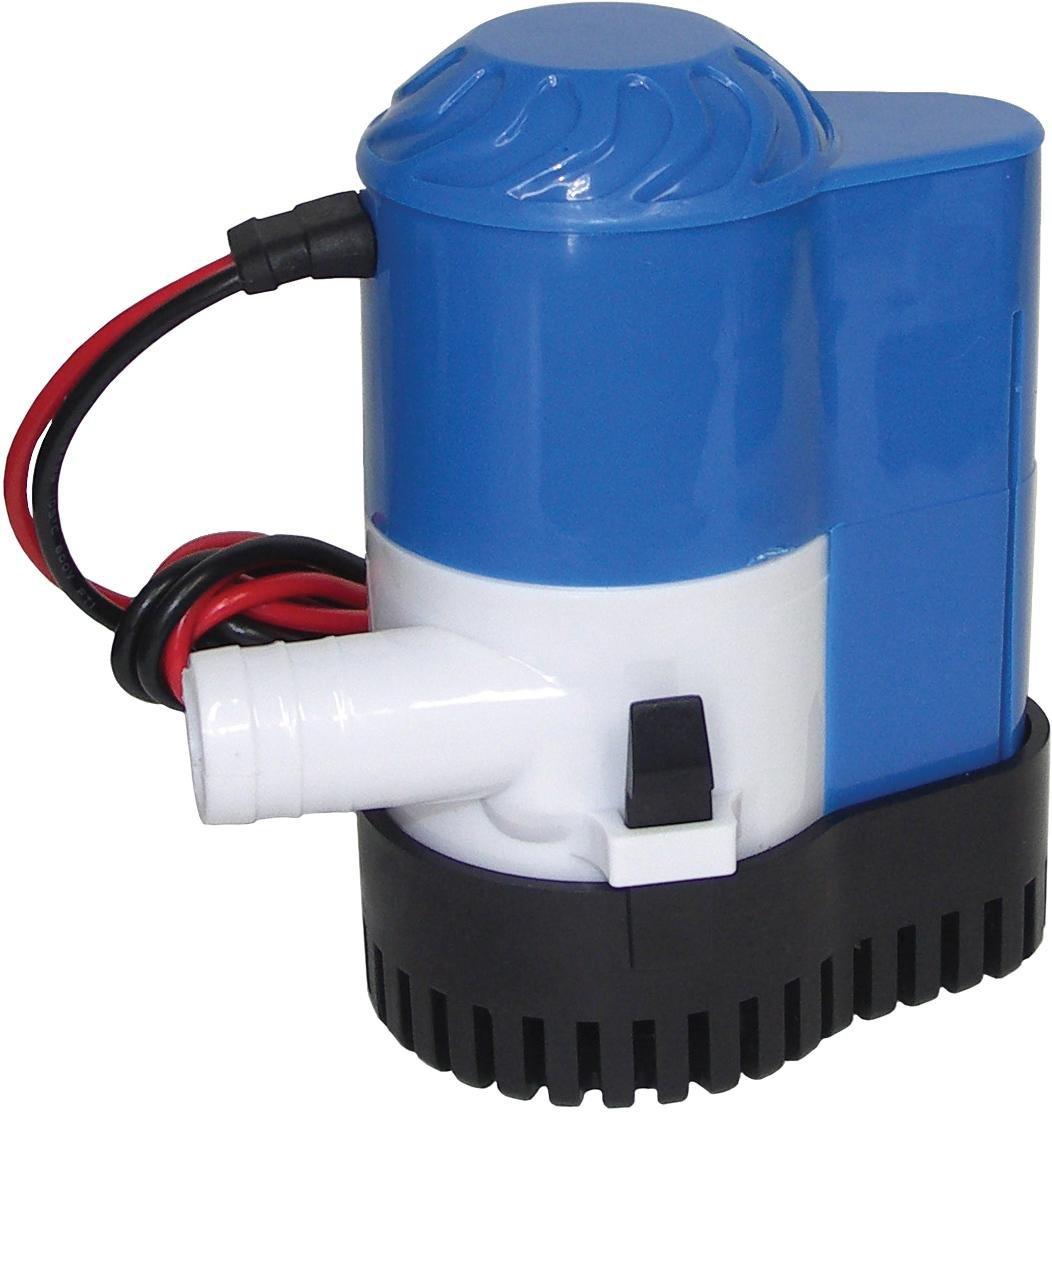 Shoreline Marine 800 GPH Bilge Pump with Auto Switch